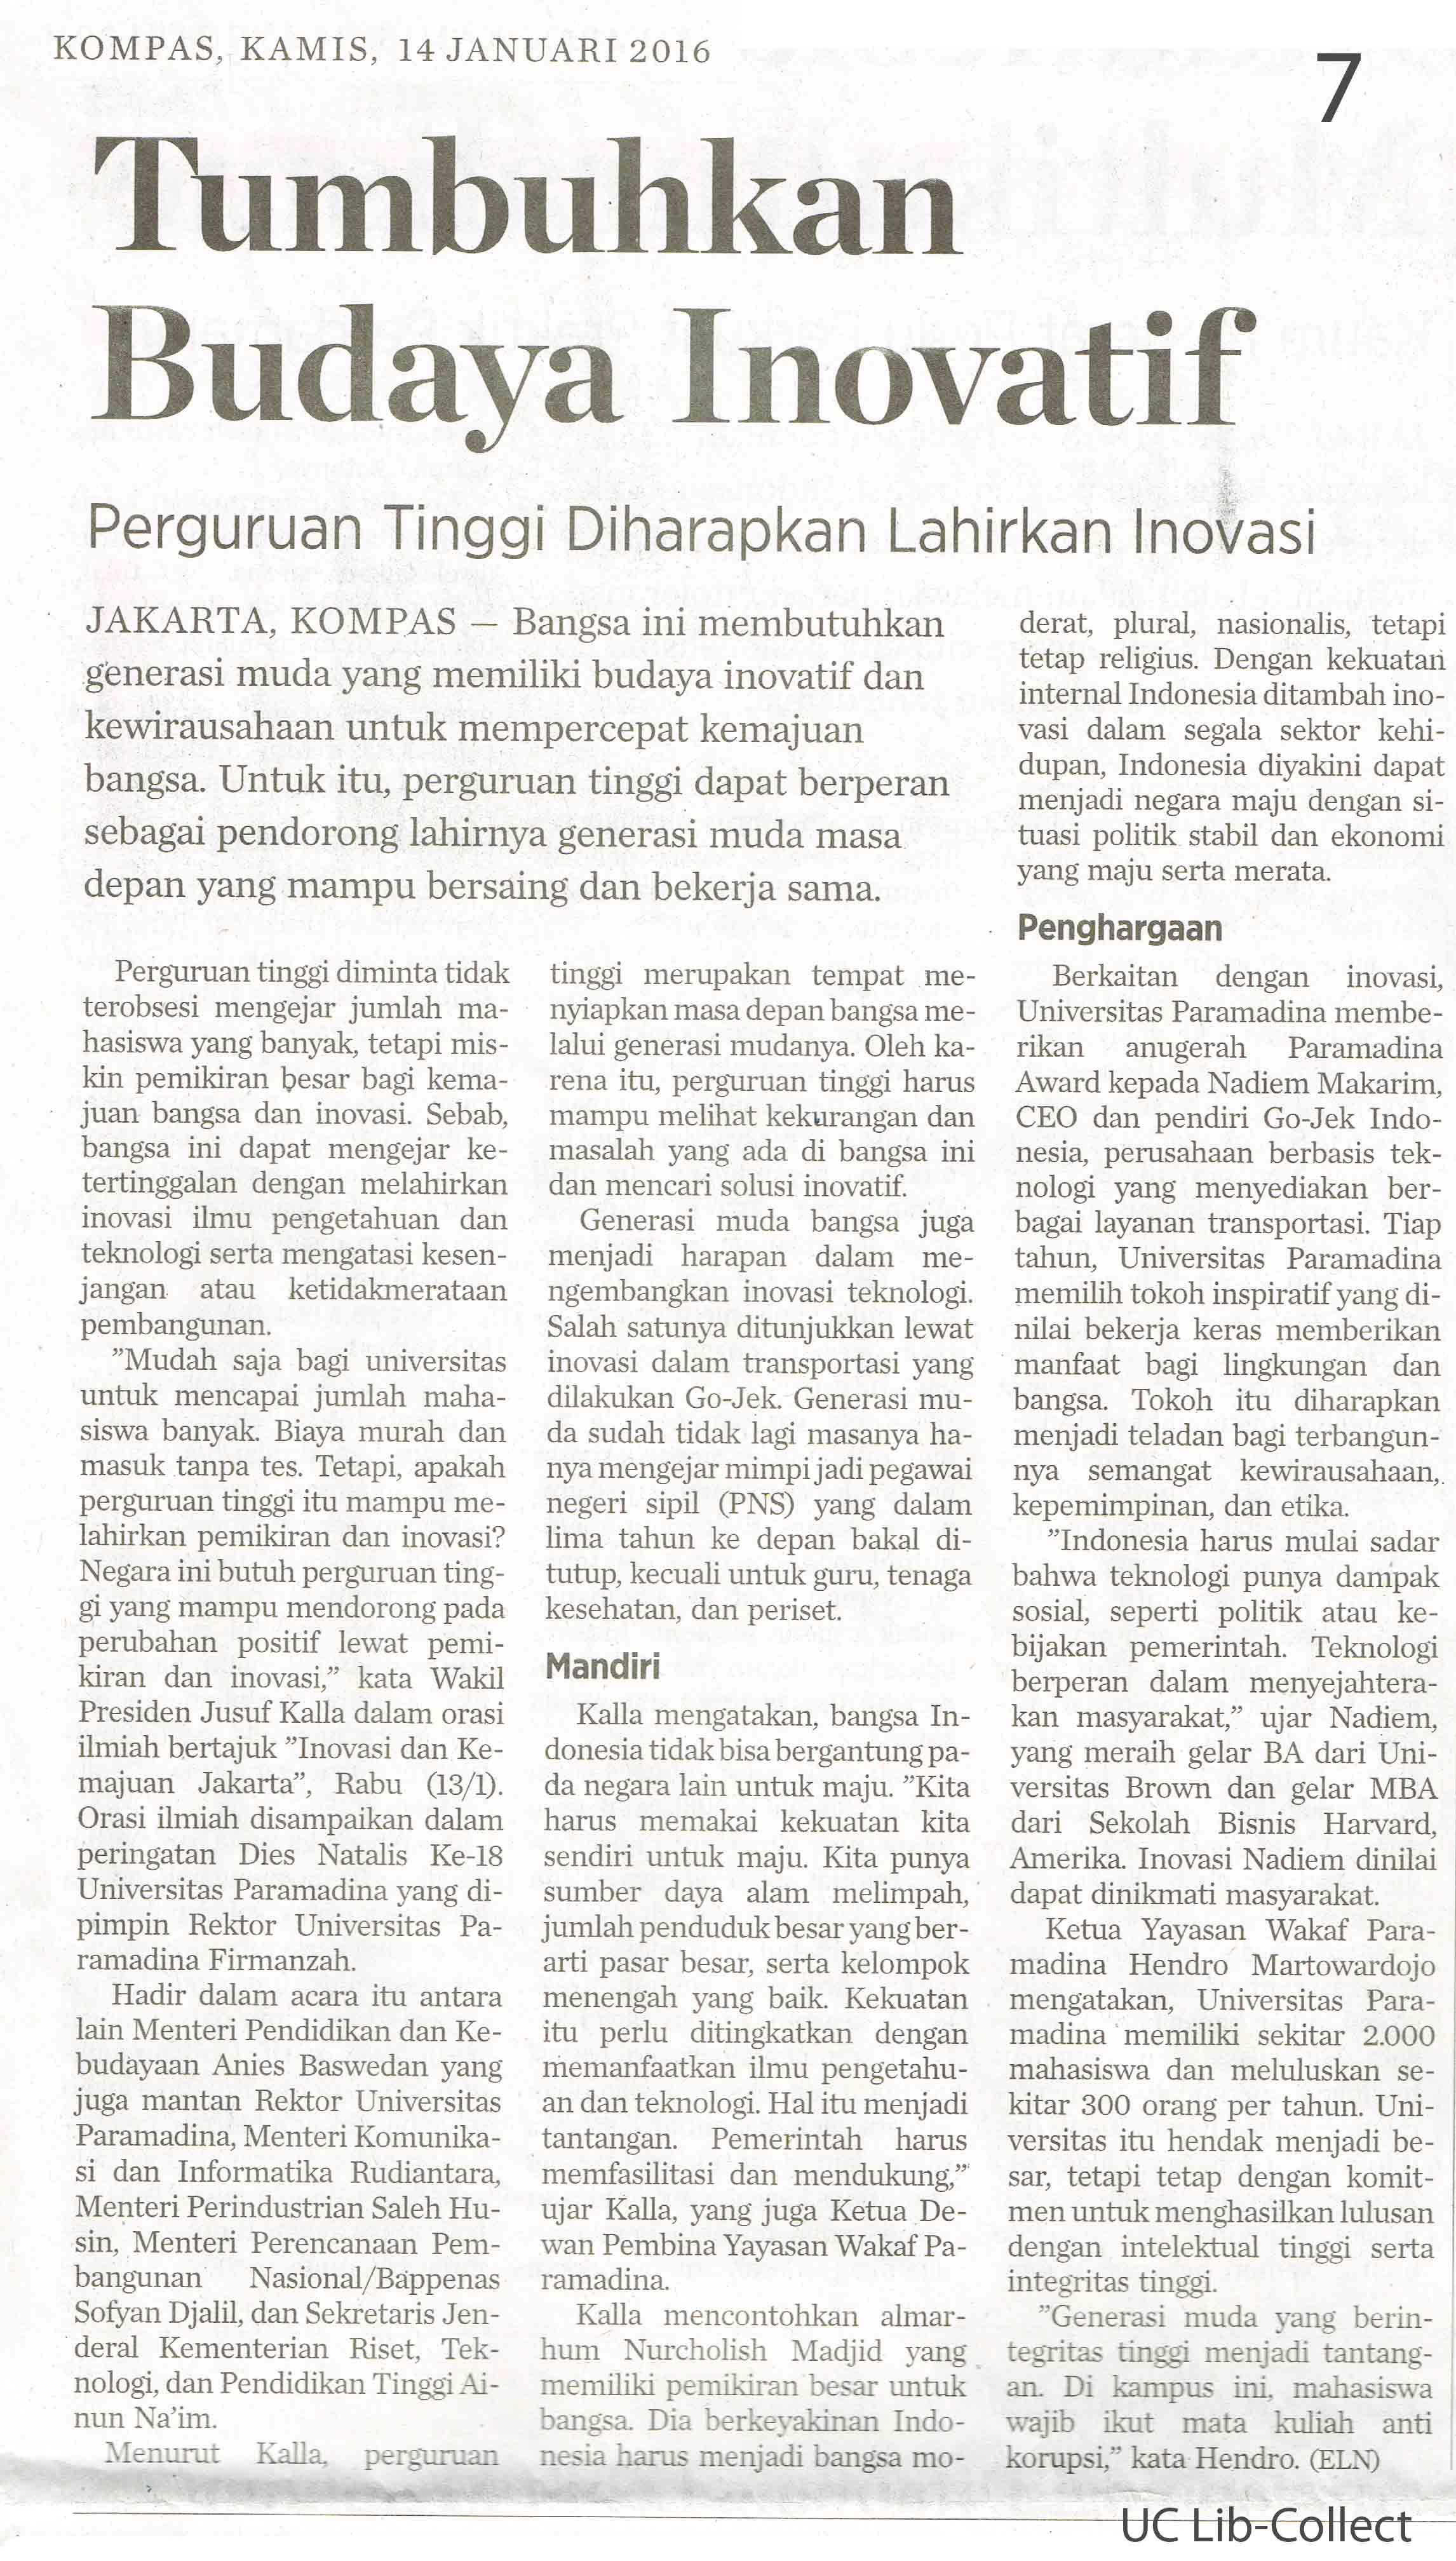 Tumbuhkan Budaya Inovatif. Kompas.14 Januari 2016.Hal.11